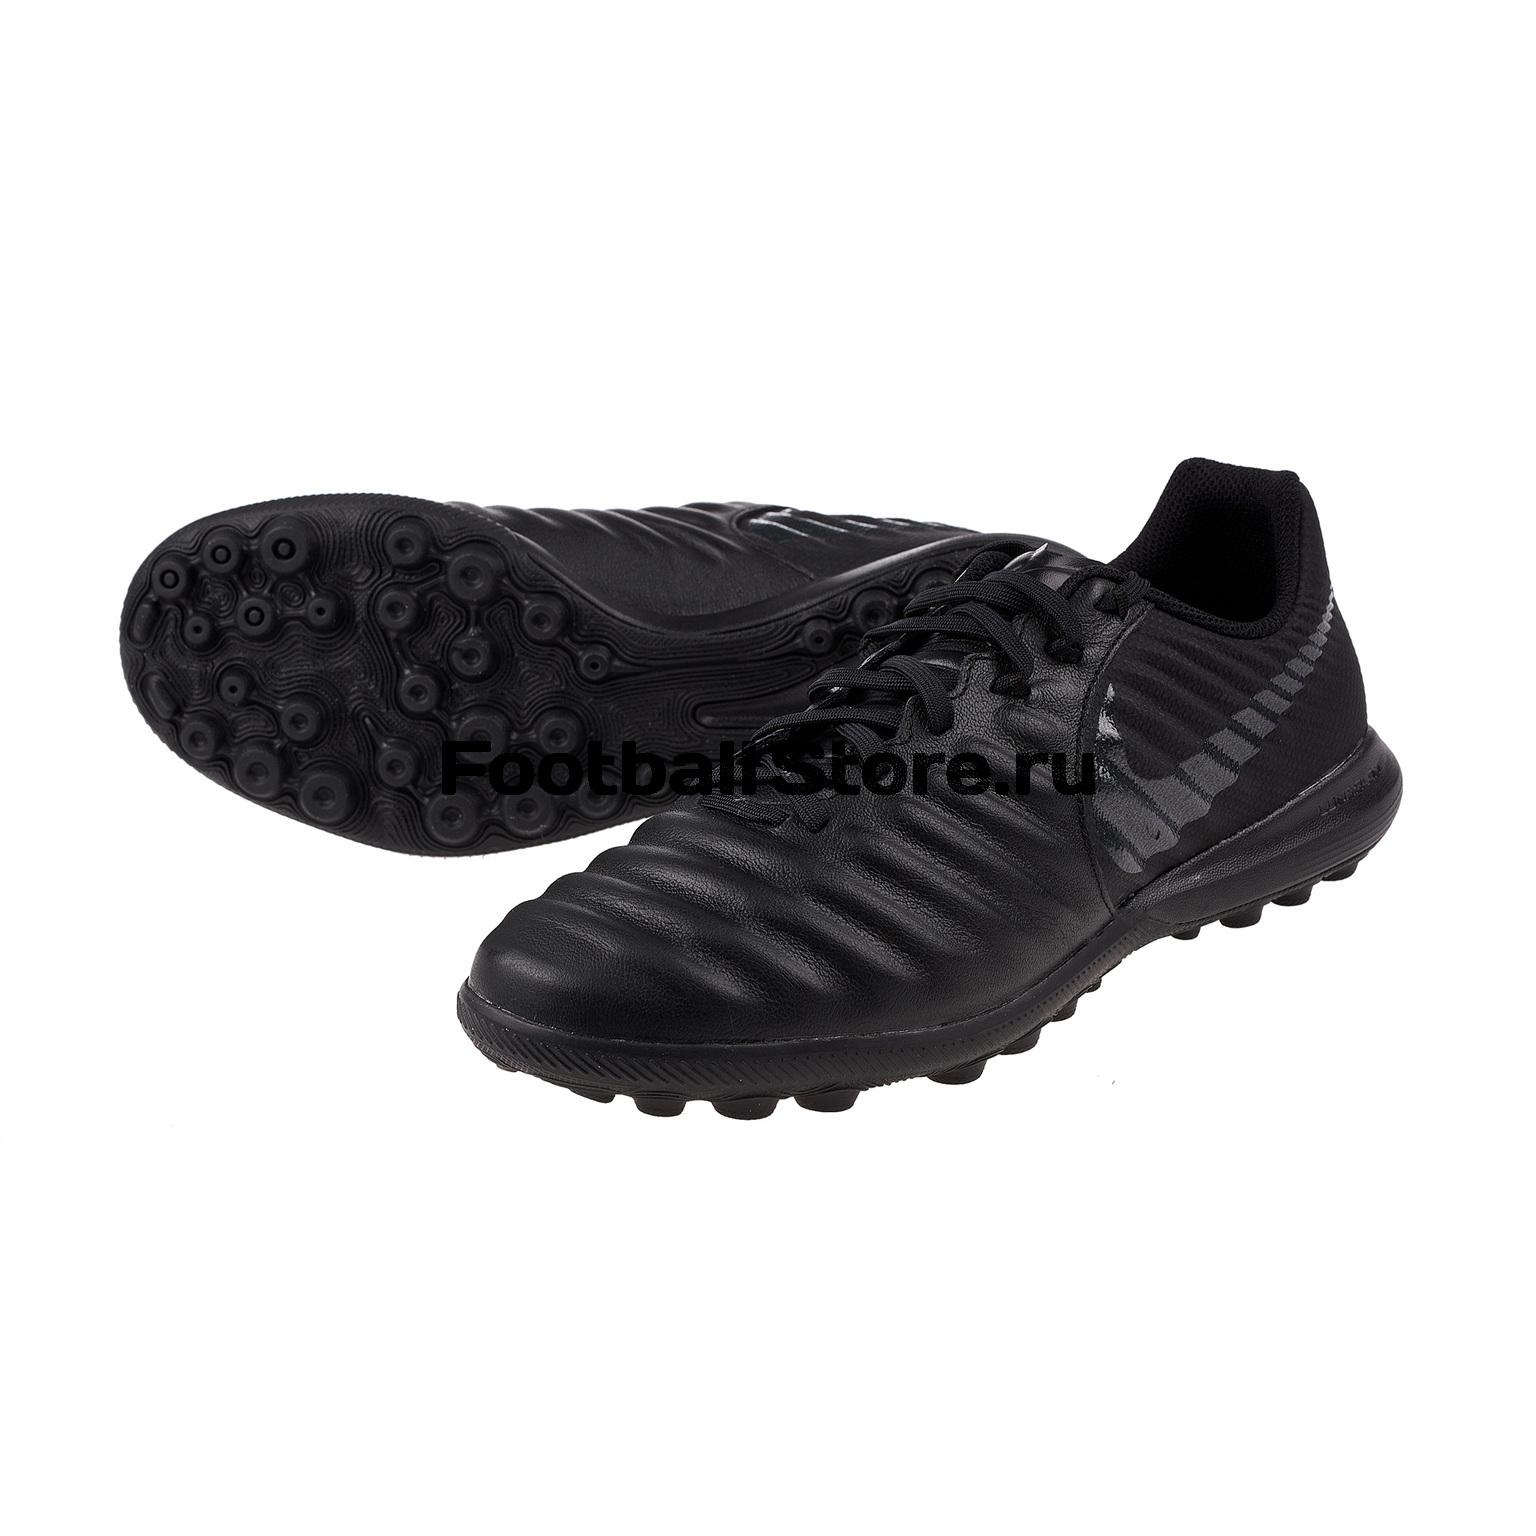 Шиповки Nike Lunar LegendX 7 Pro TF AH7249-001 шиповки nike lunar legendx 7 pro tf ah7249 080